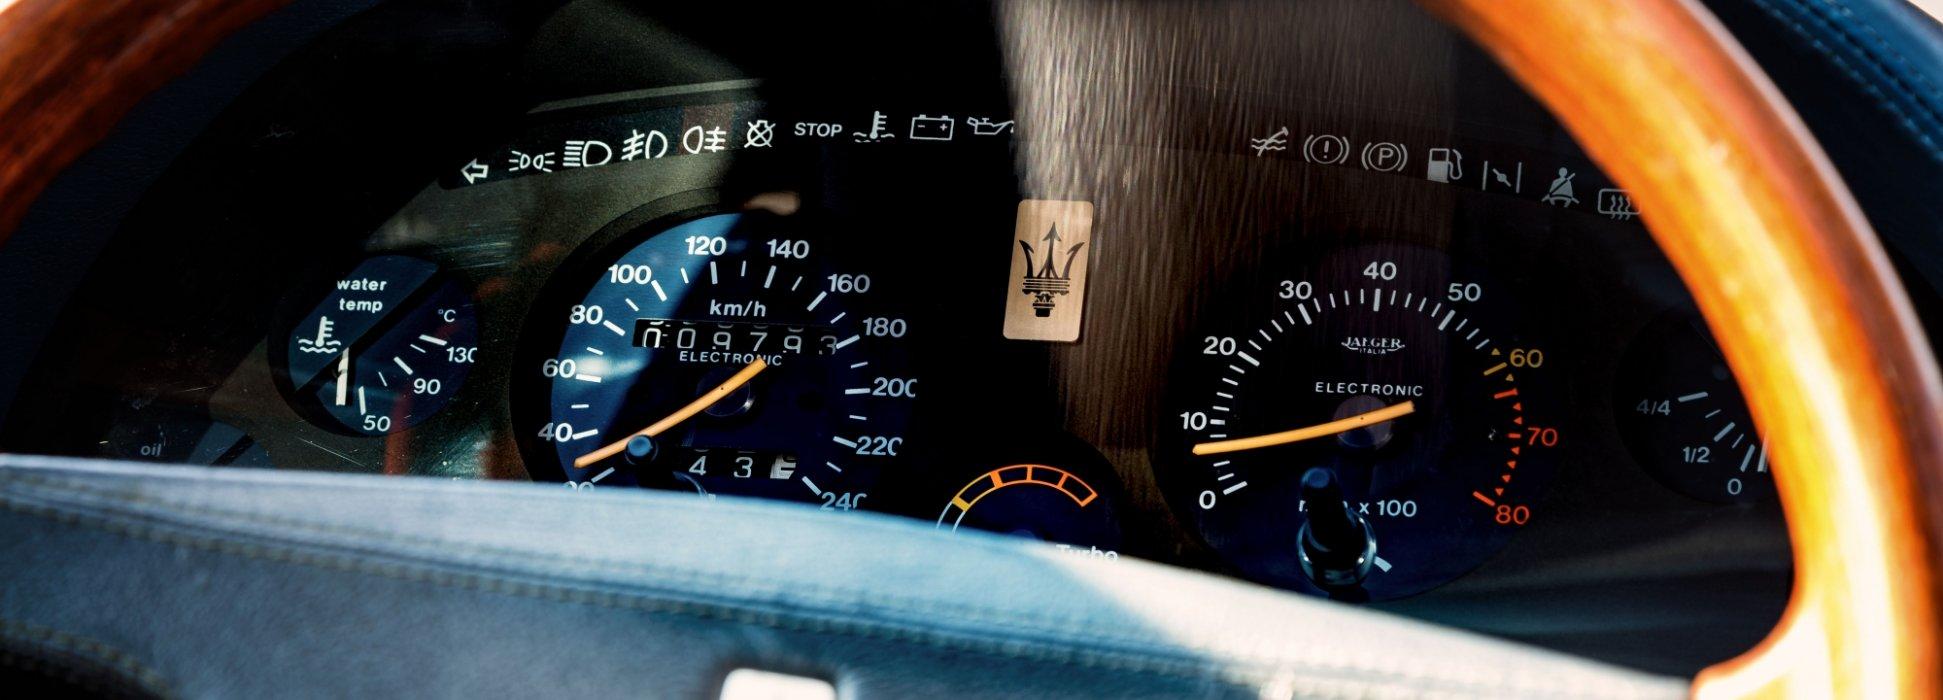 Maserati 422 Limousine 1